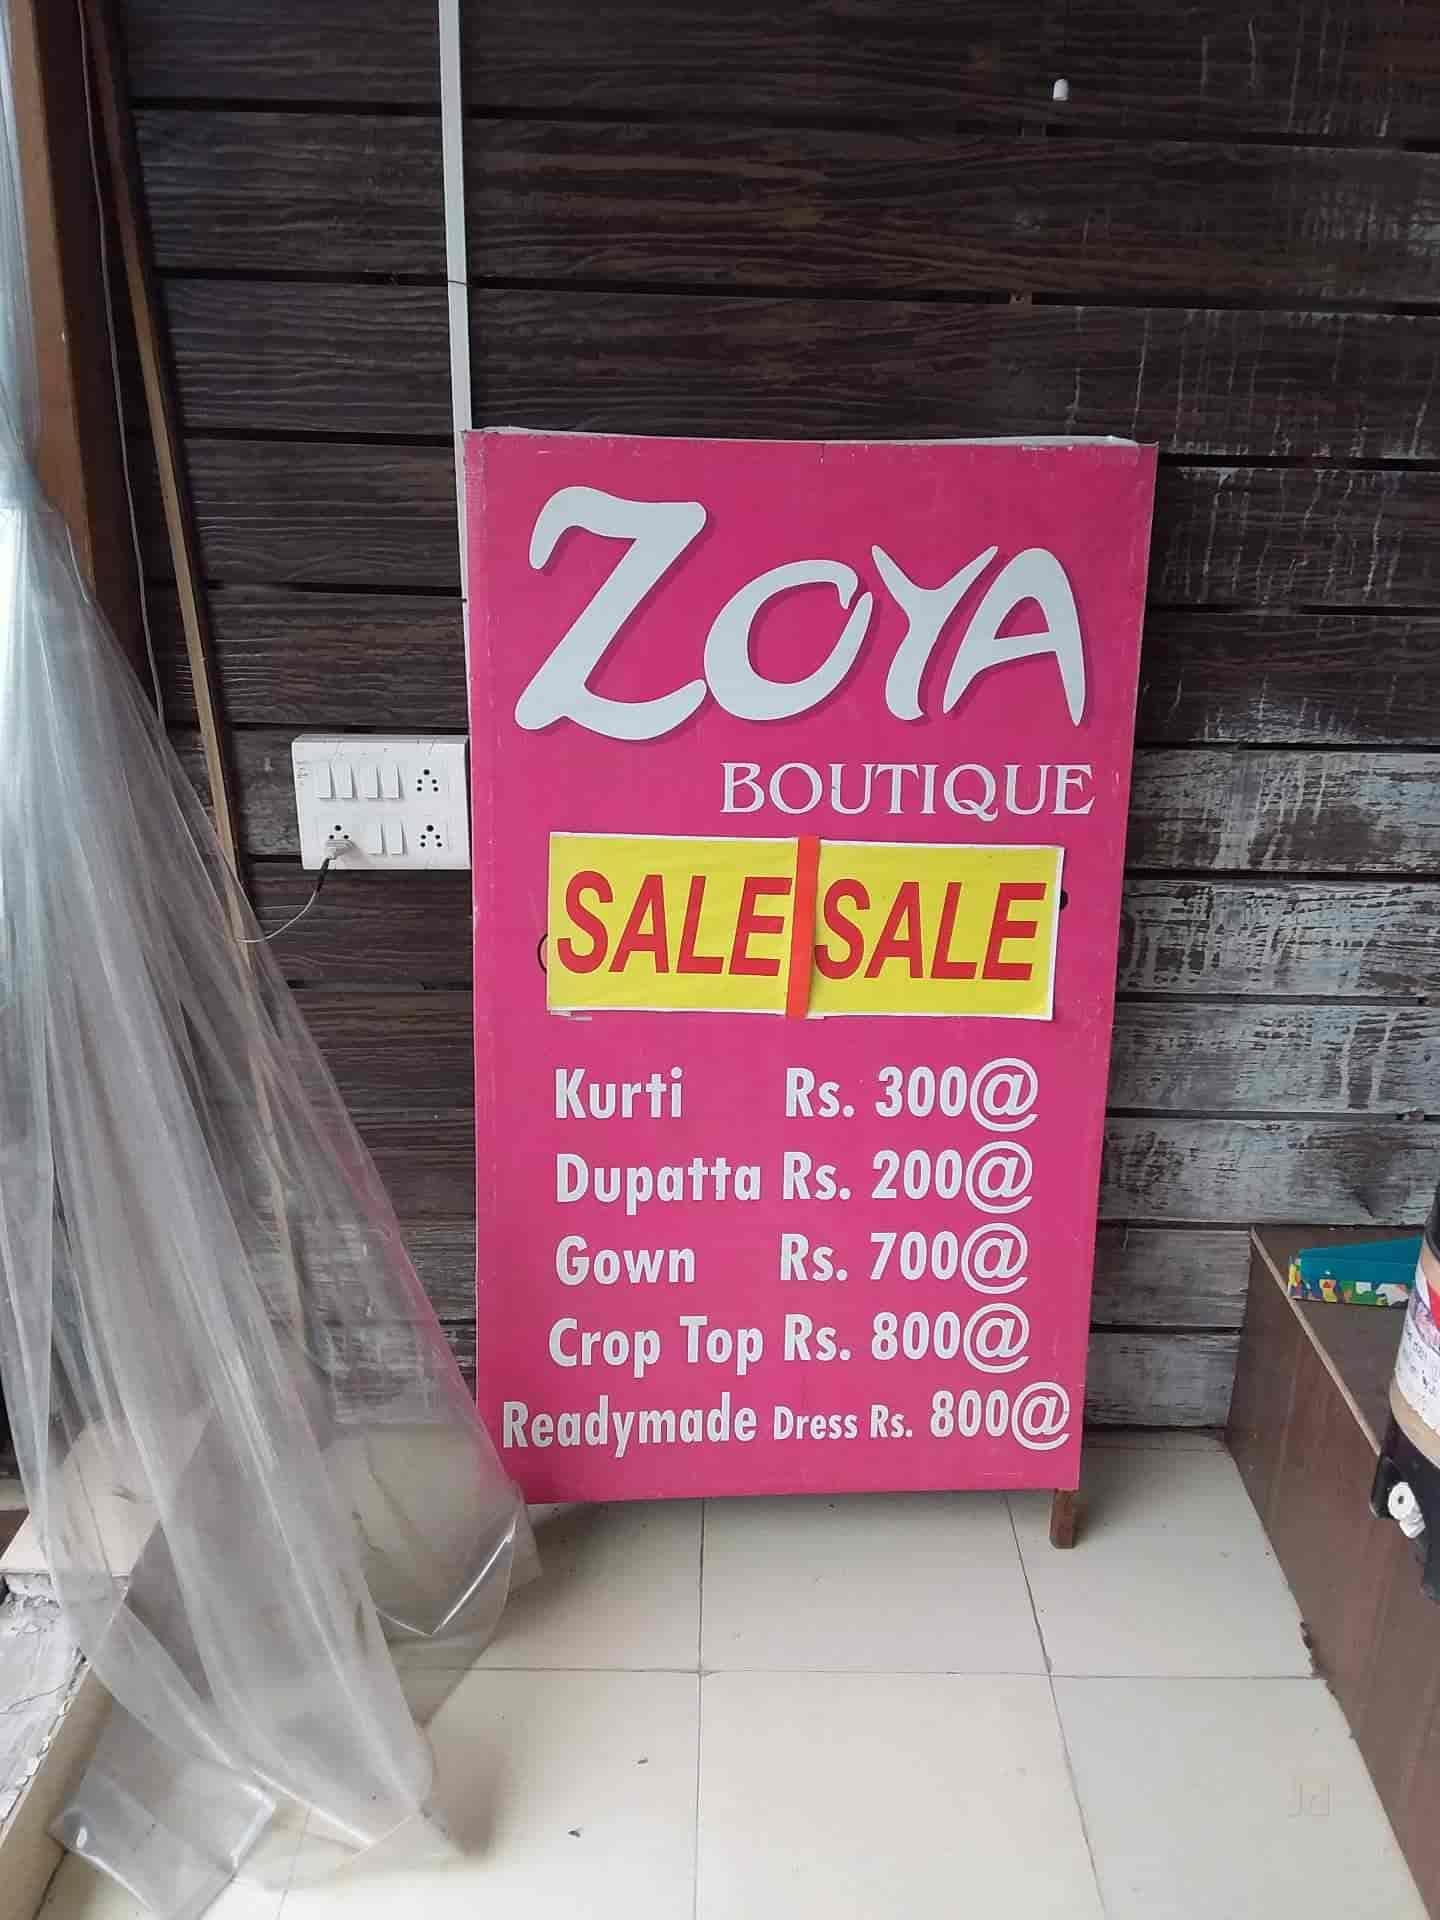 Zoya Boutique Photos, Gurukul, Ahmedabad- Pictures & Images